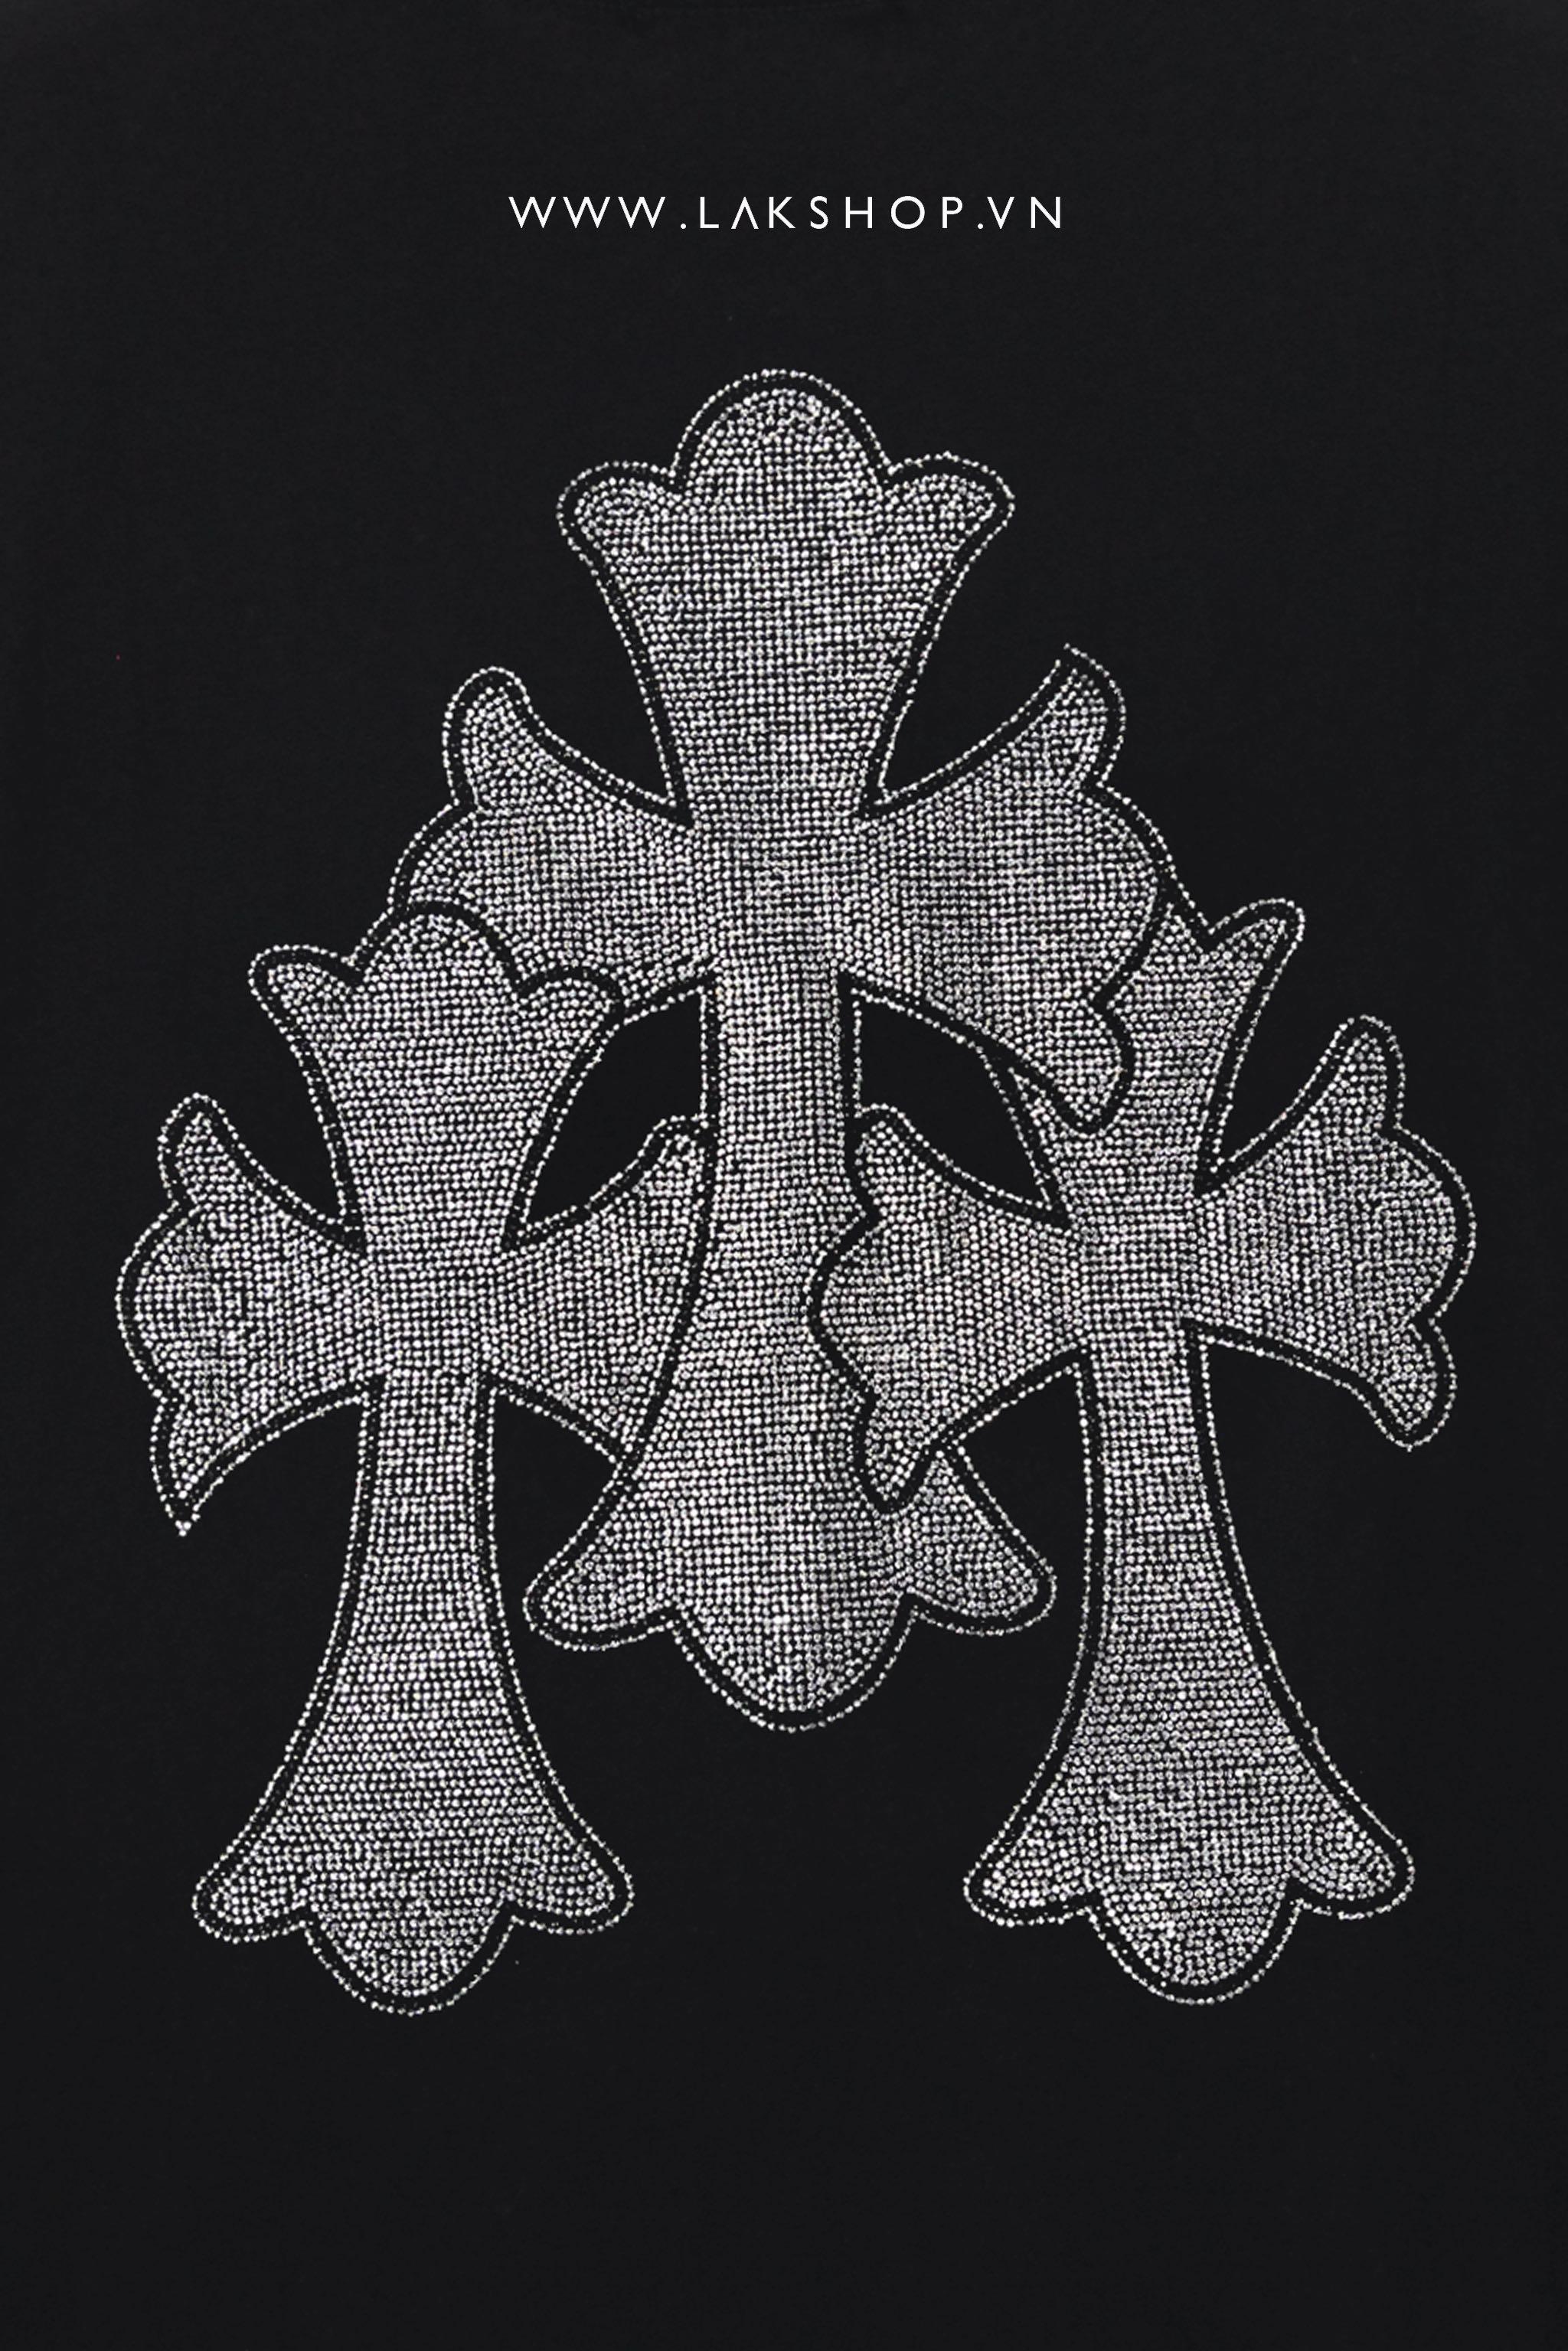 Louis Vuitton Removable Pocket Bleached Denim Shirt (Form rộng)